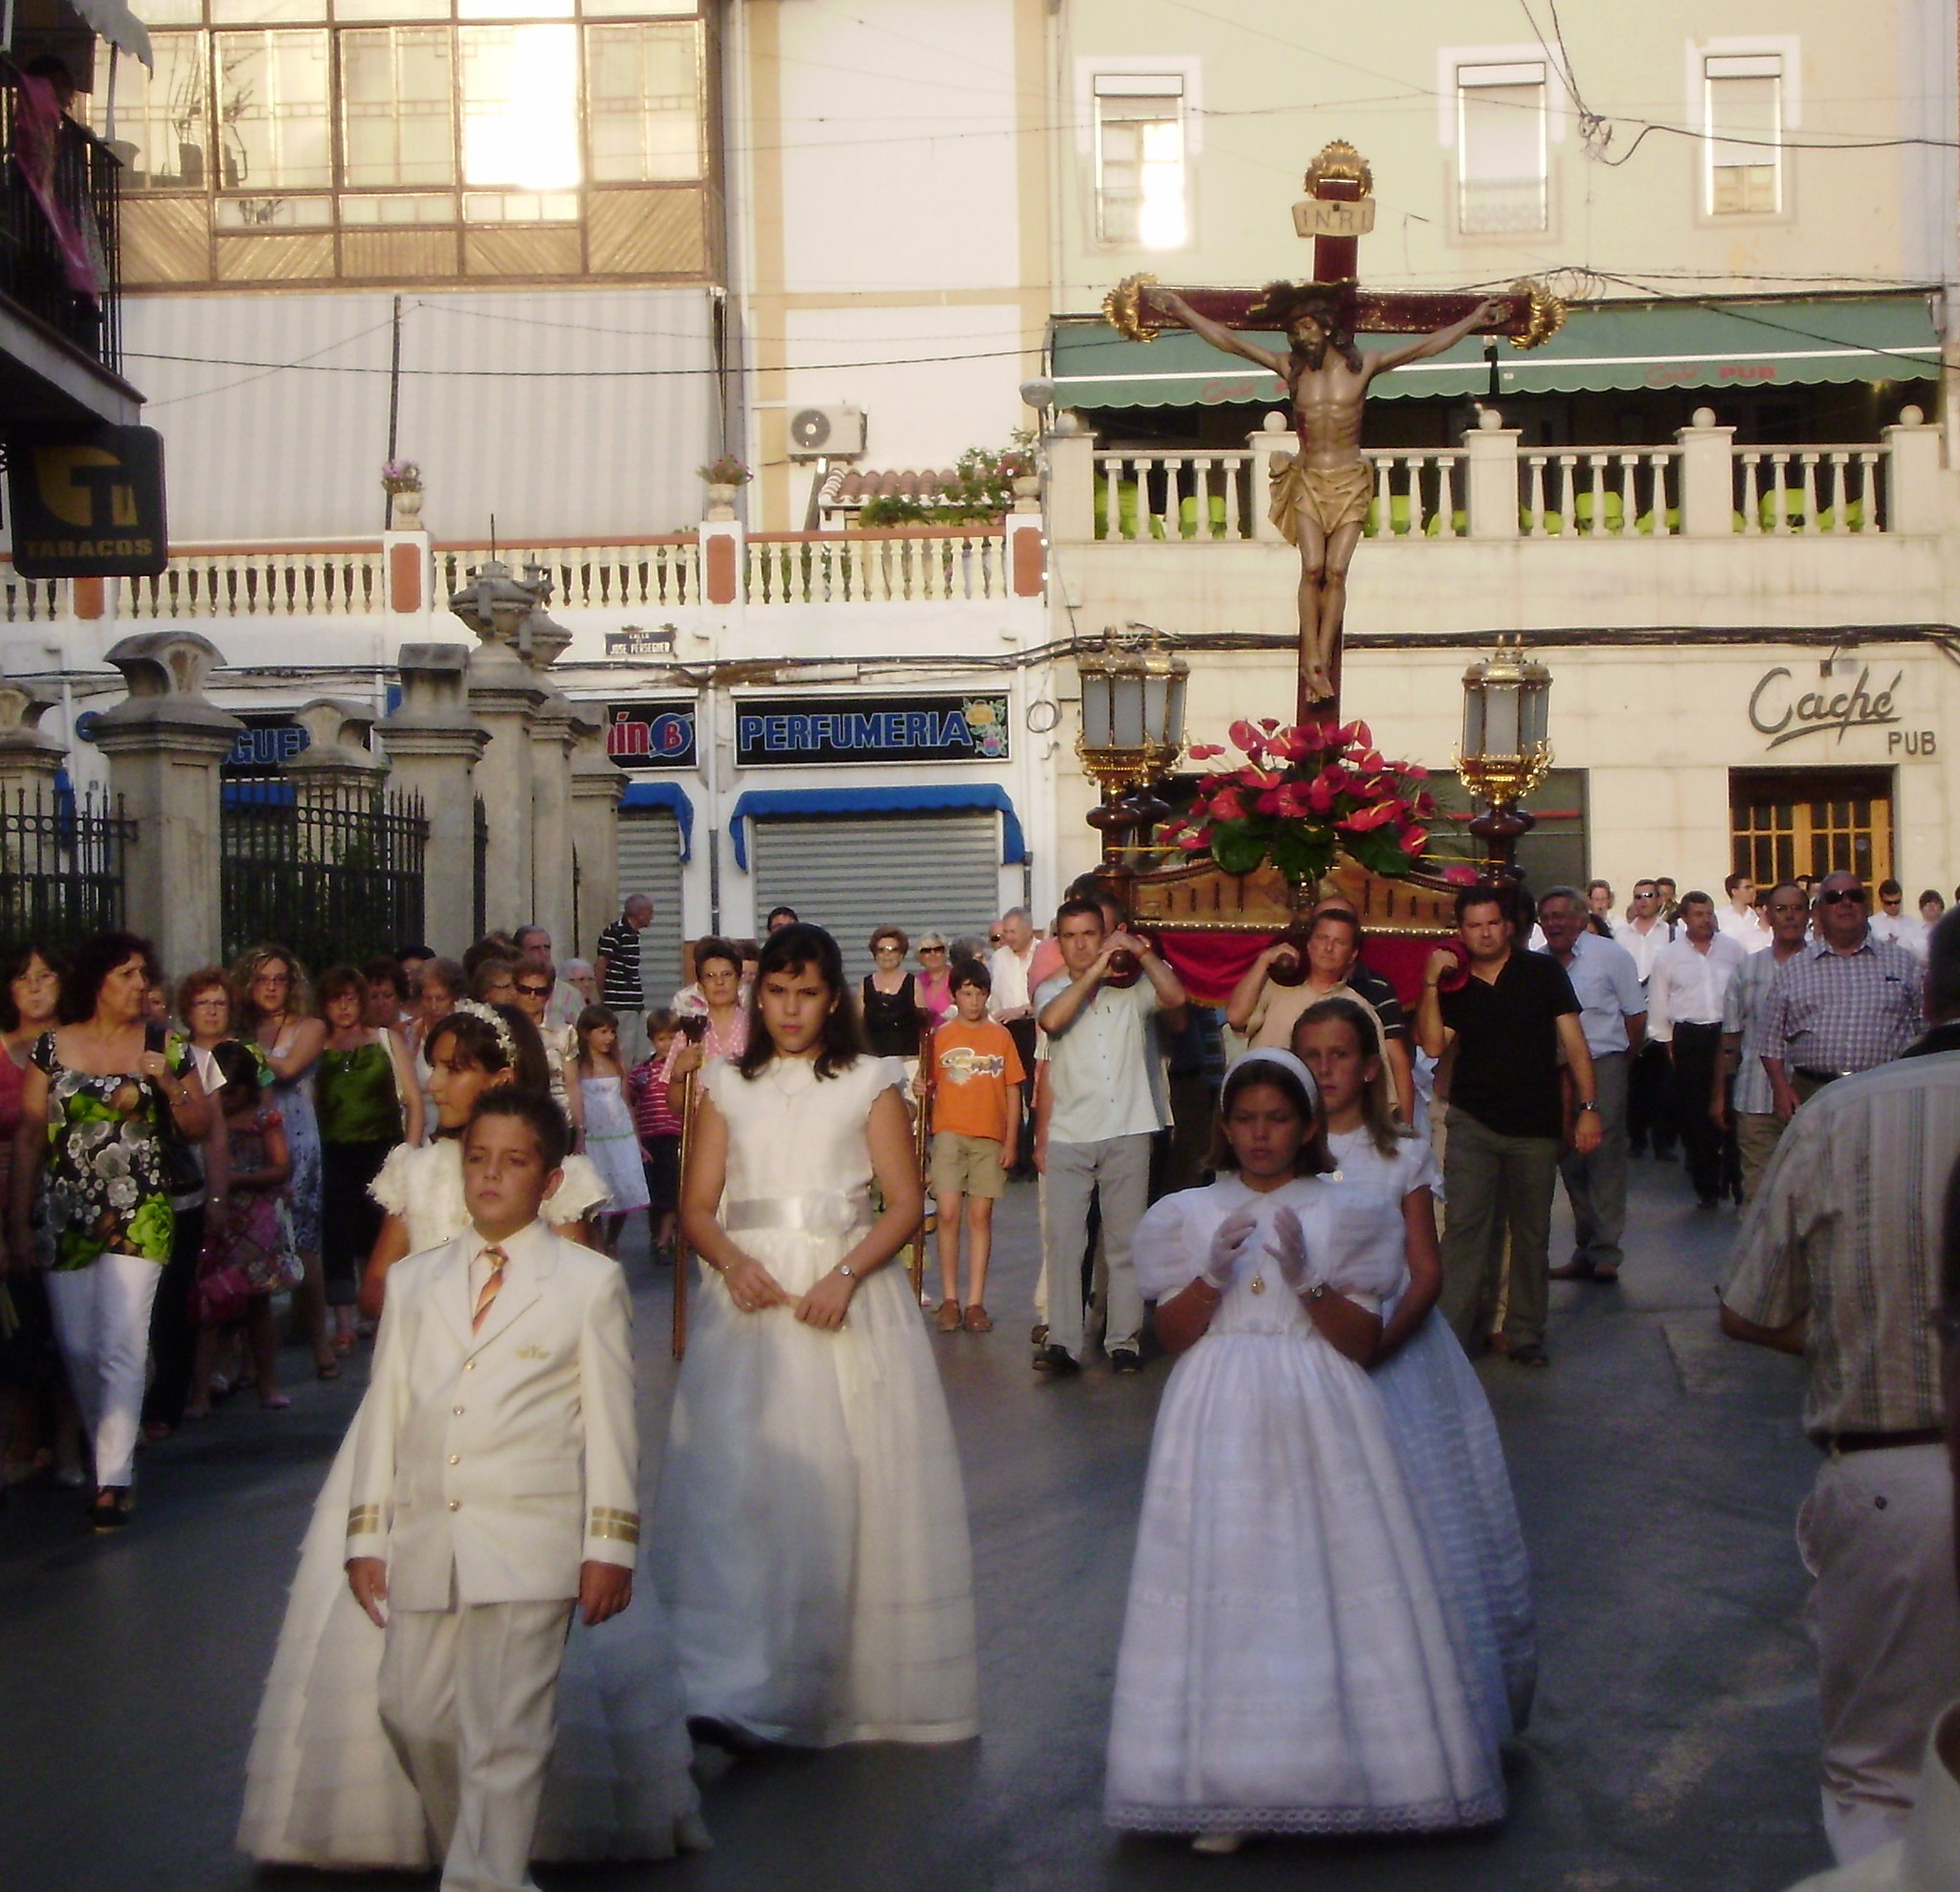 (2009-07-05) - Procesión Subida - Javier Romero Ripoll - (08)